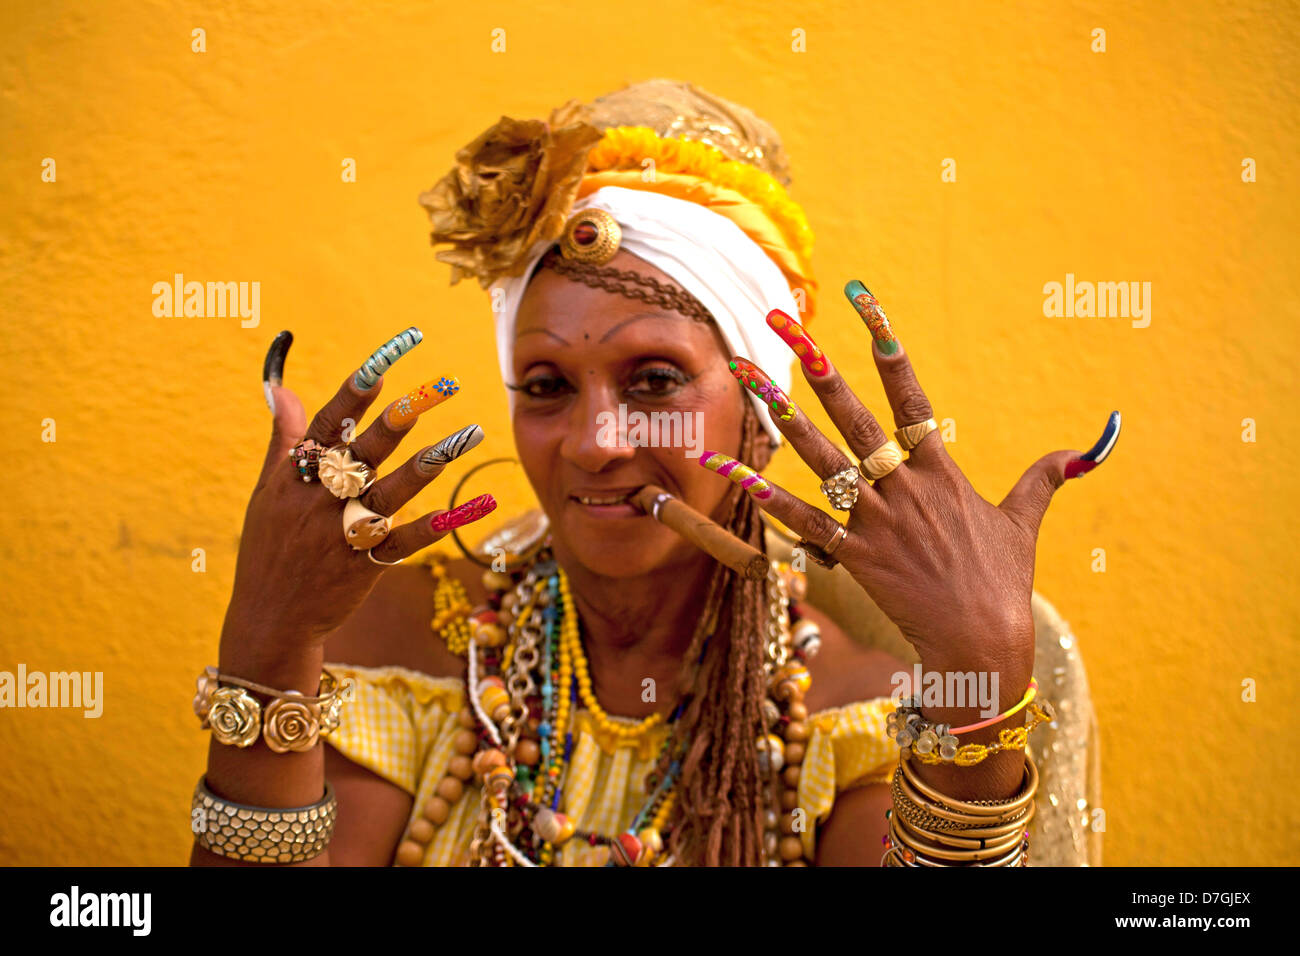 Senora Habana, A priestess of the afro-cuban Santeria with colourful long nails and cigar, Havana, Cuba, Caribbean - Stock Image